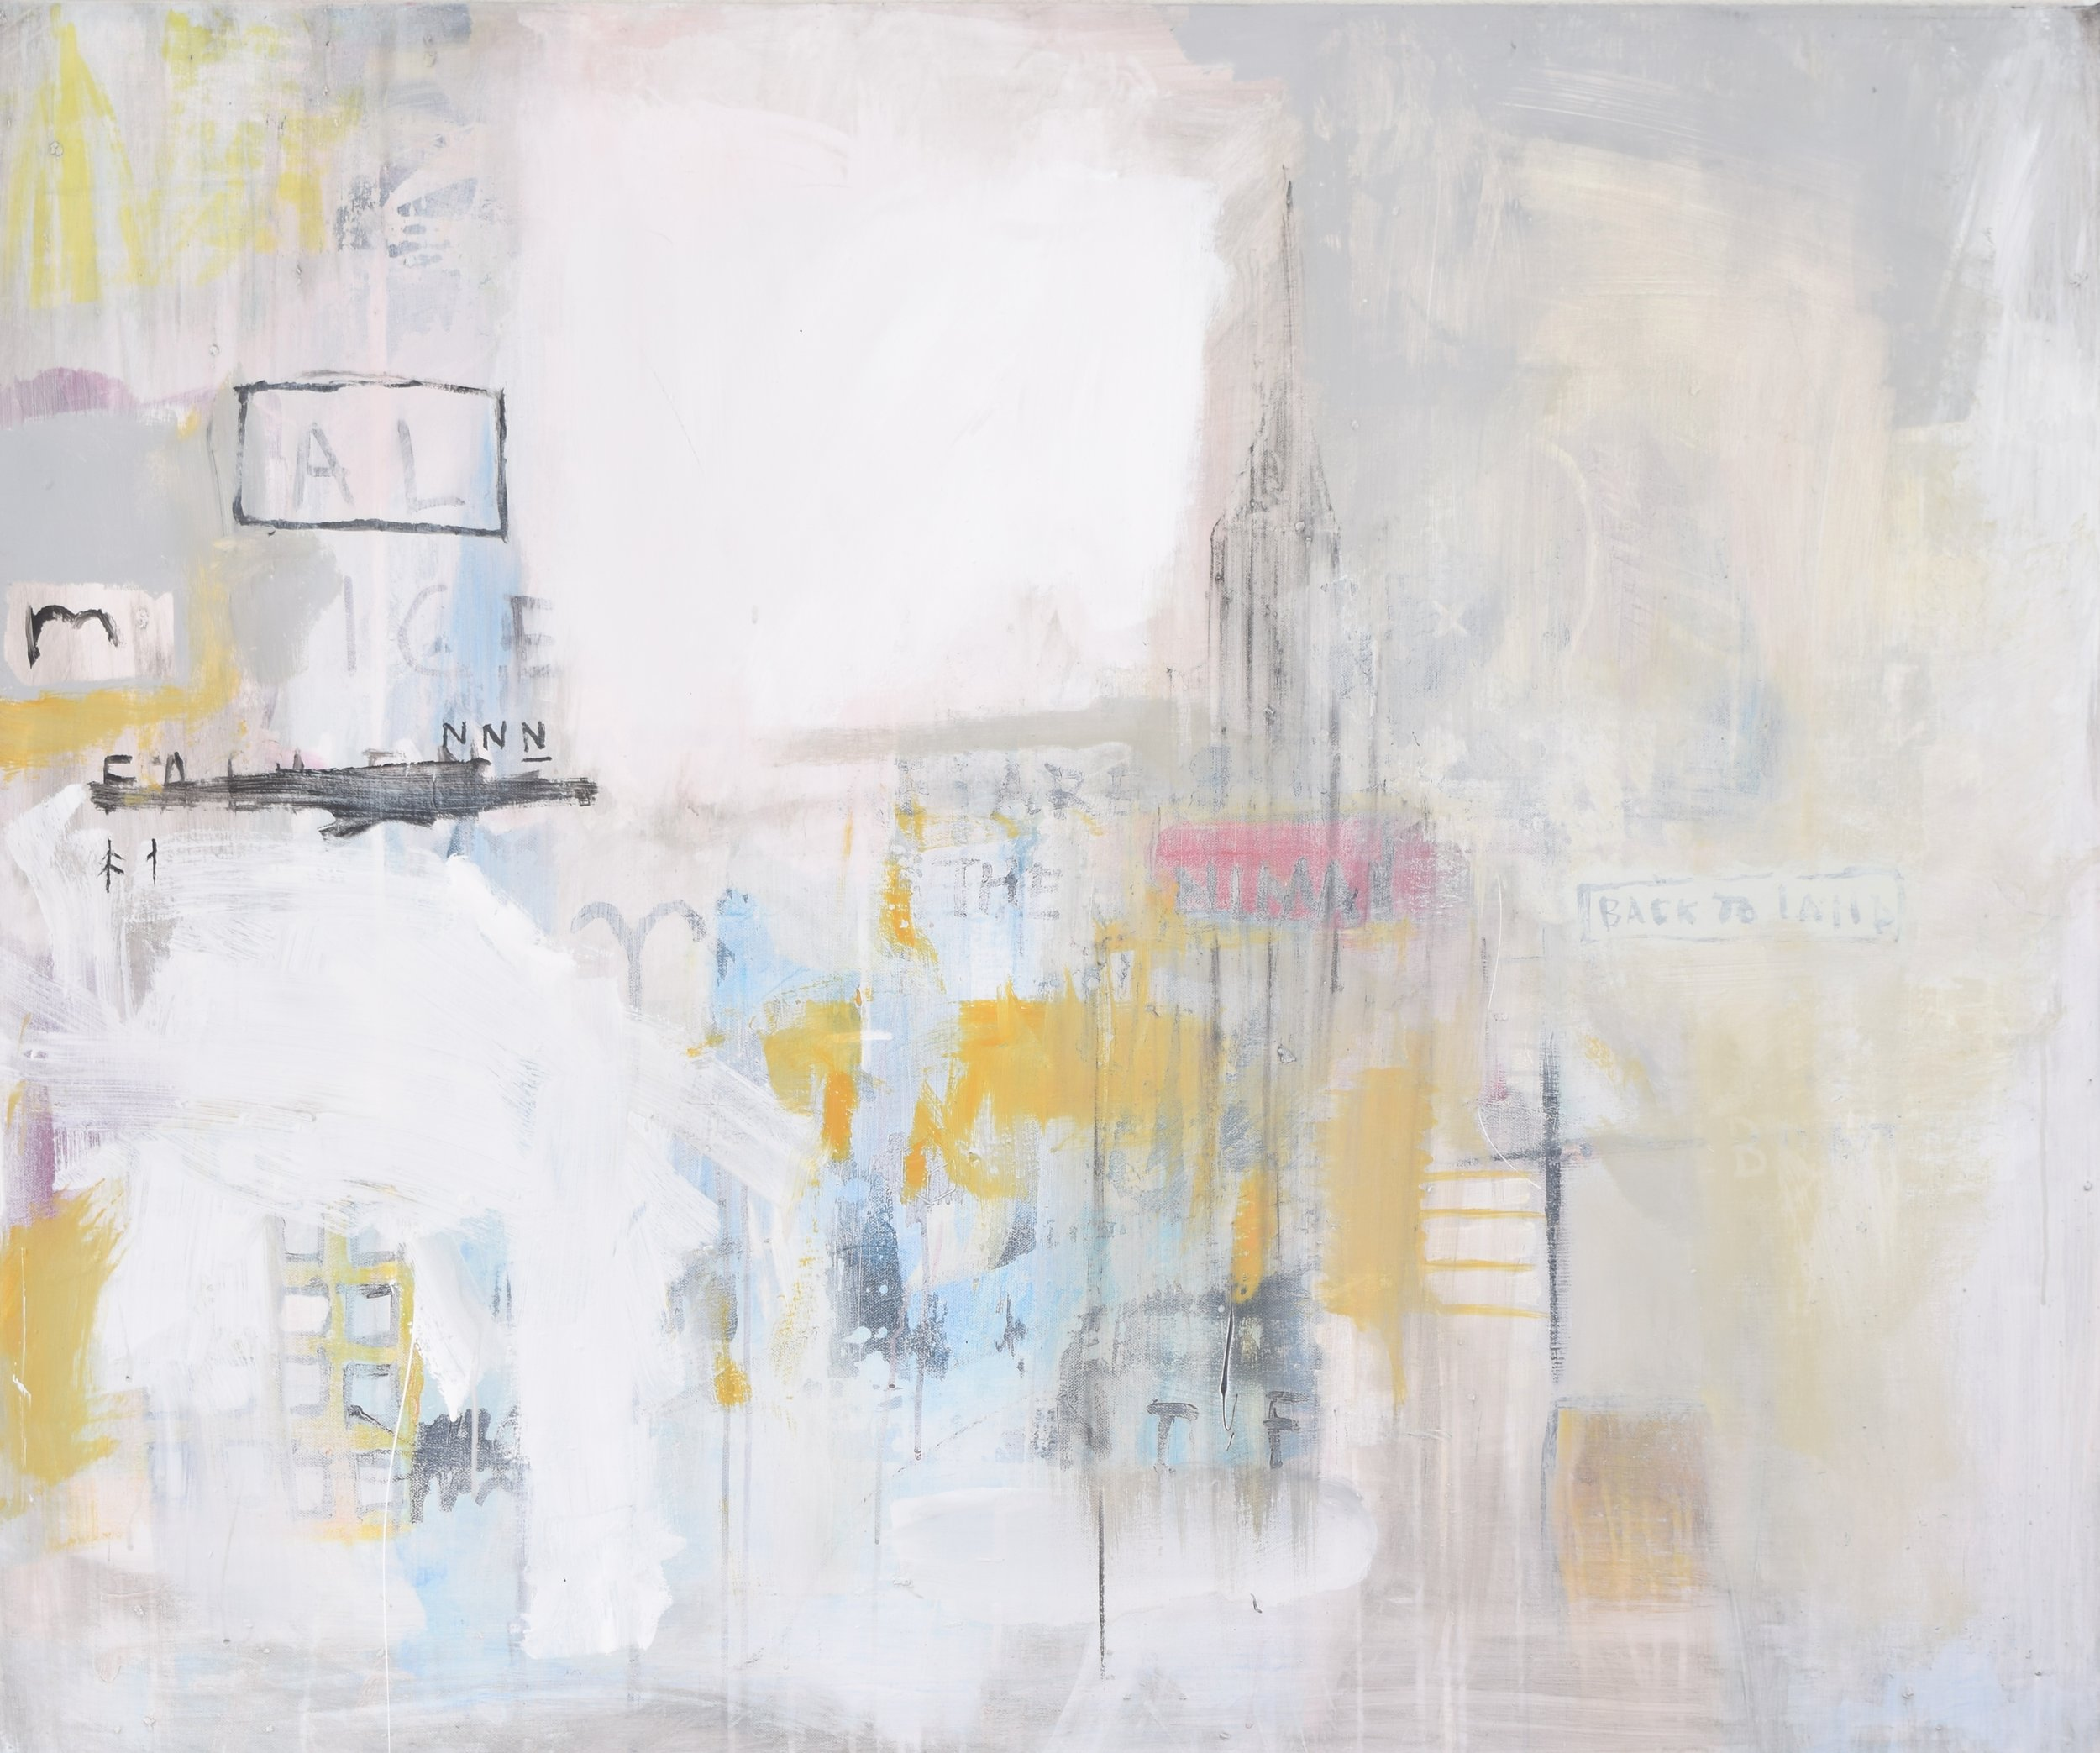 'MIRROR' 2015    Arylic, household and spray paint on canvas 100 x 120 x 4 cm